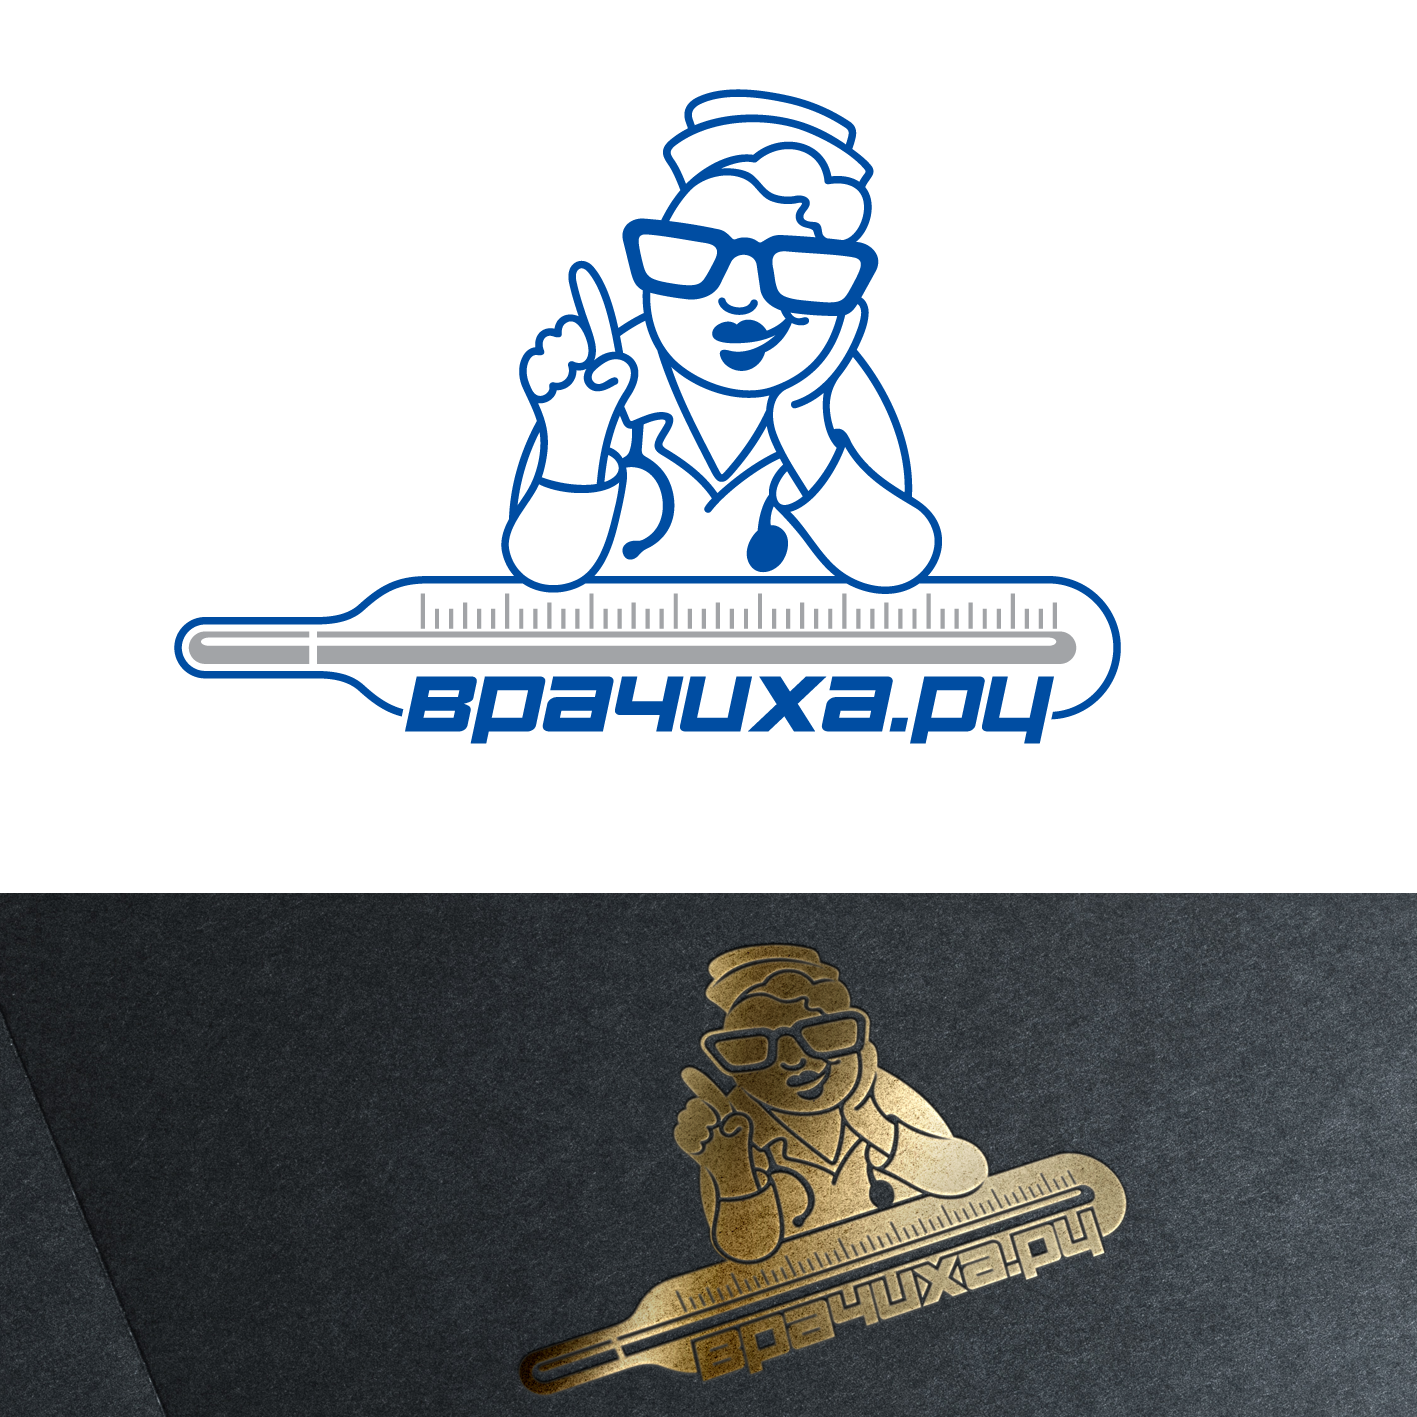 Необходимо разработать логотип для медицинского портала фото f_5575bfe99016e8a4.png